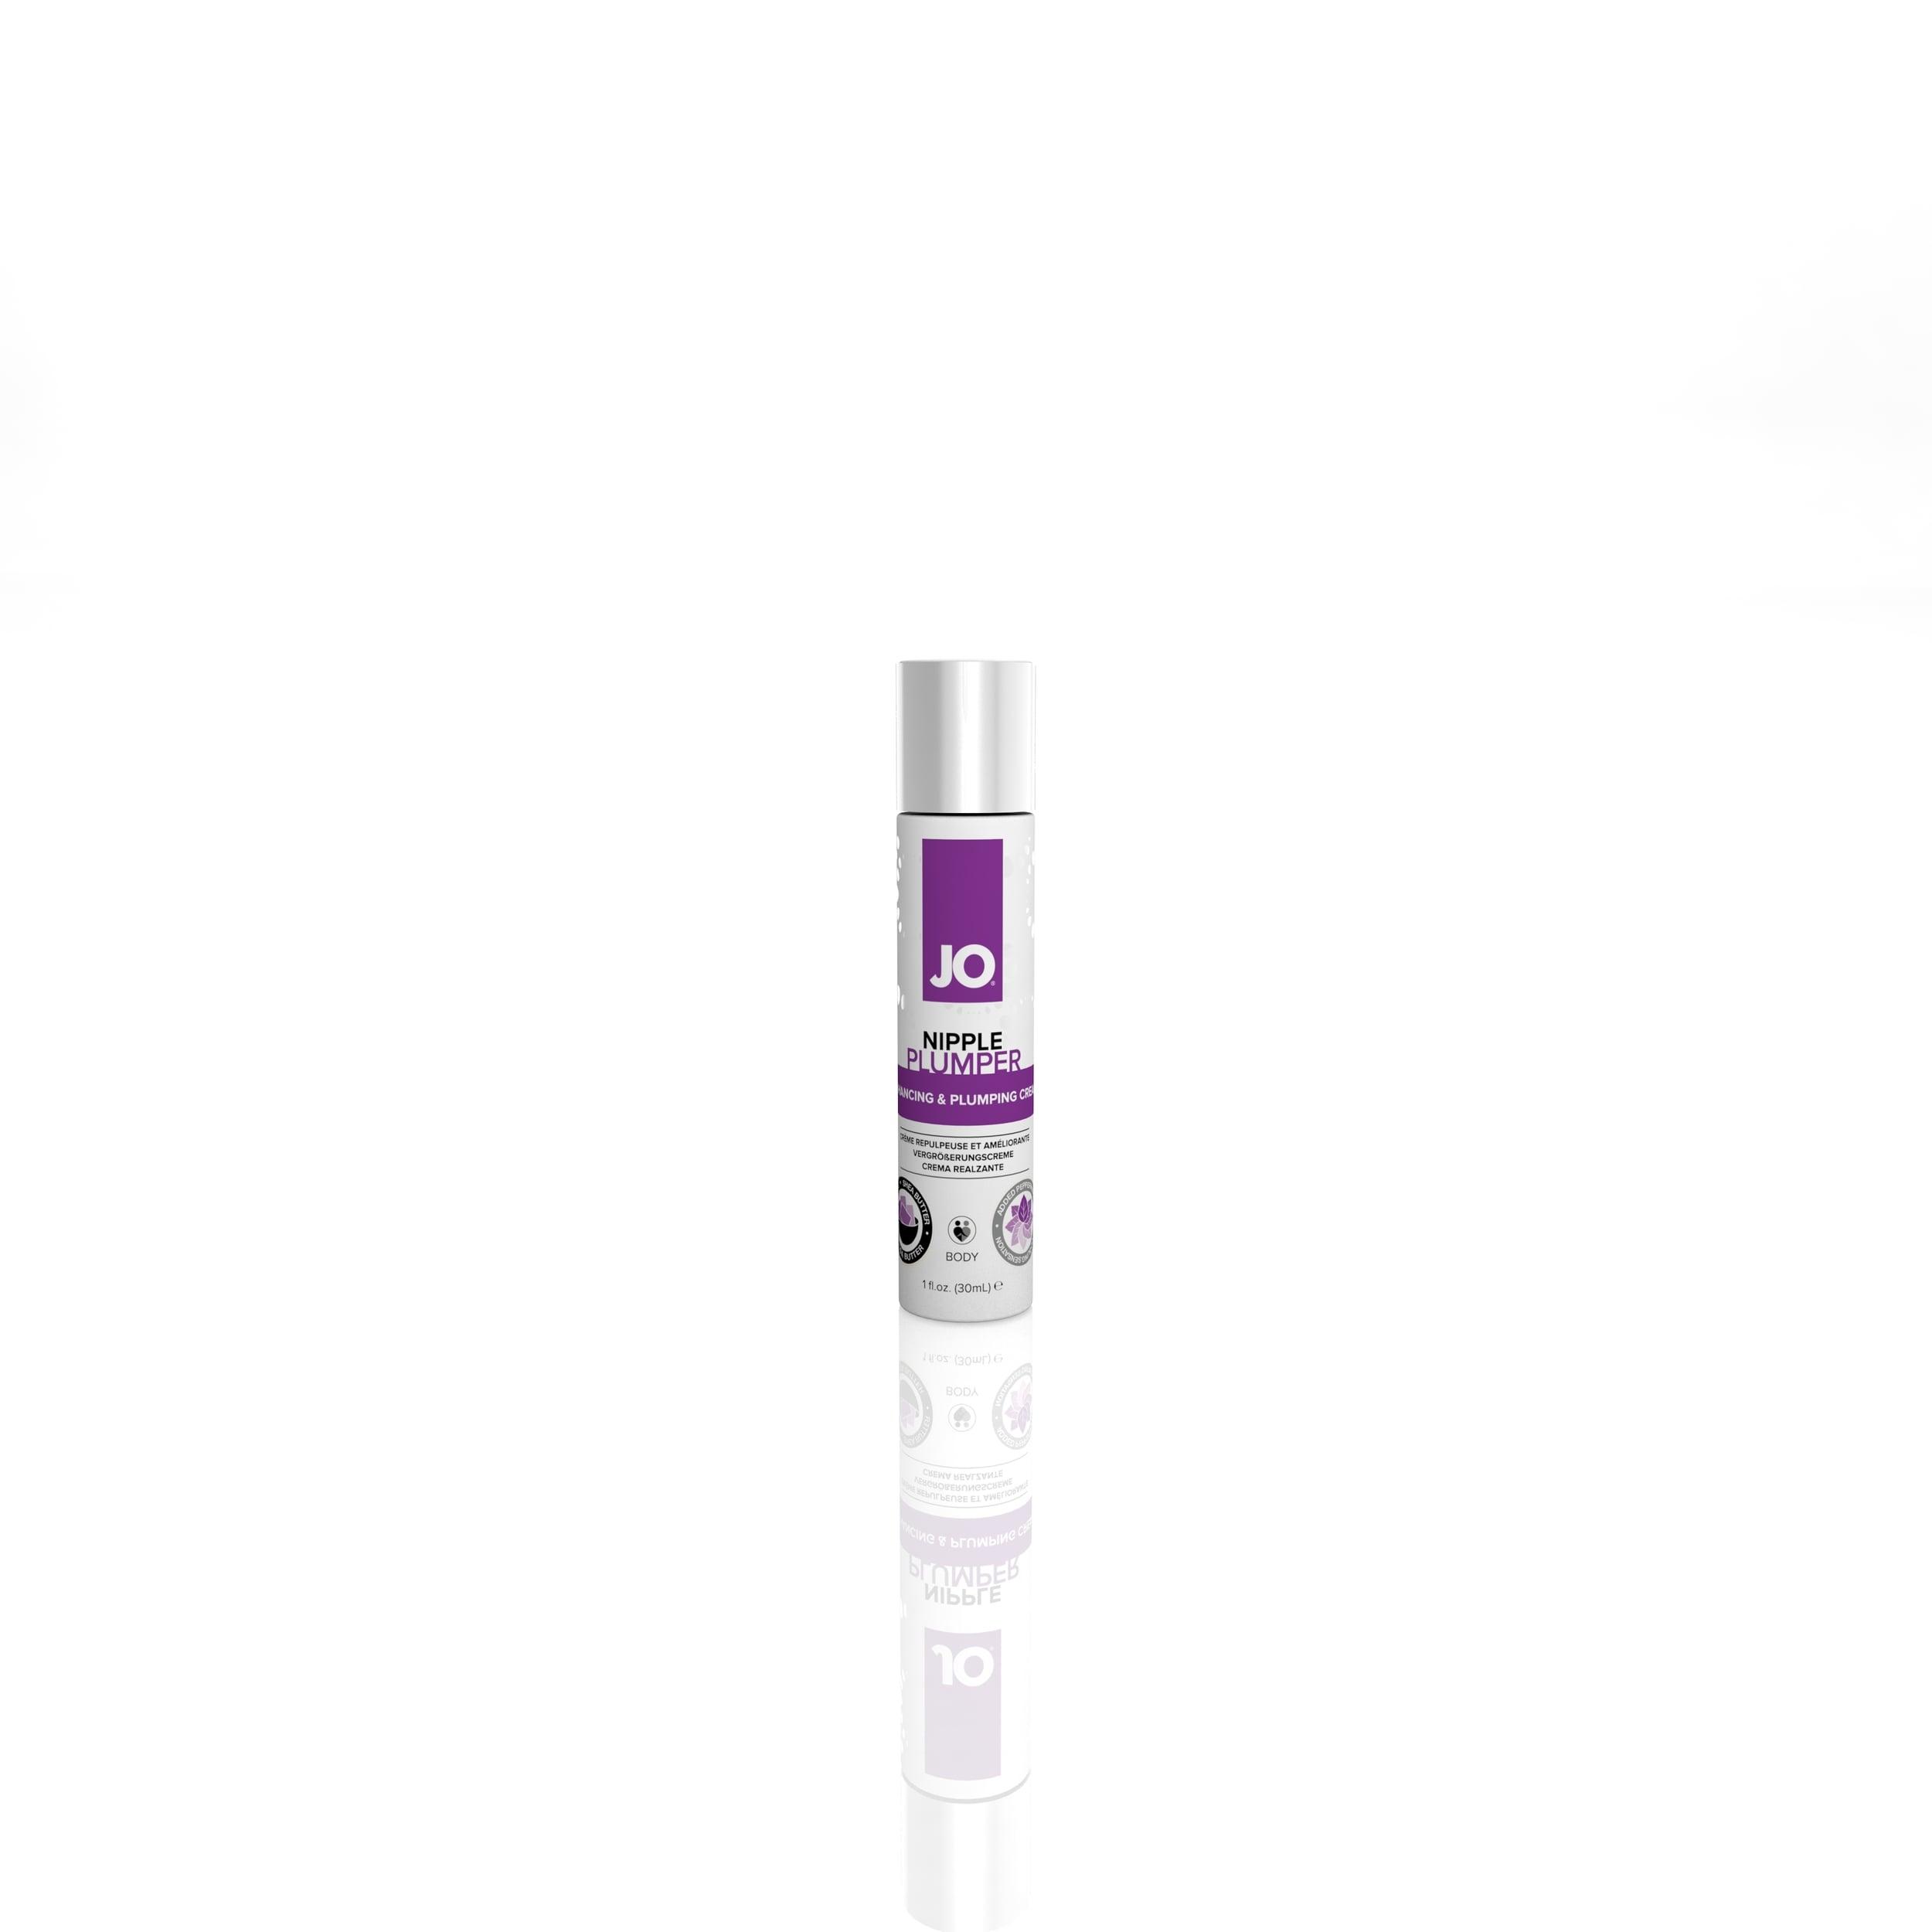 40449 - JO NIPPLE PLUMPER - ENHANCING & PLUMPING CREAM - 1fl.oz30mL (bottle).jpg